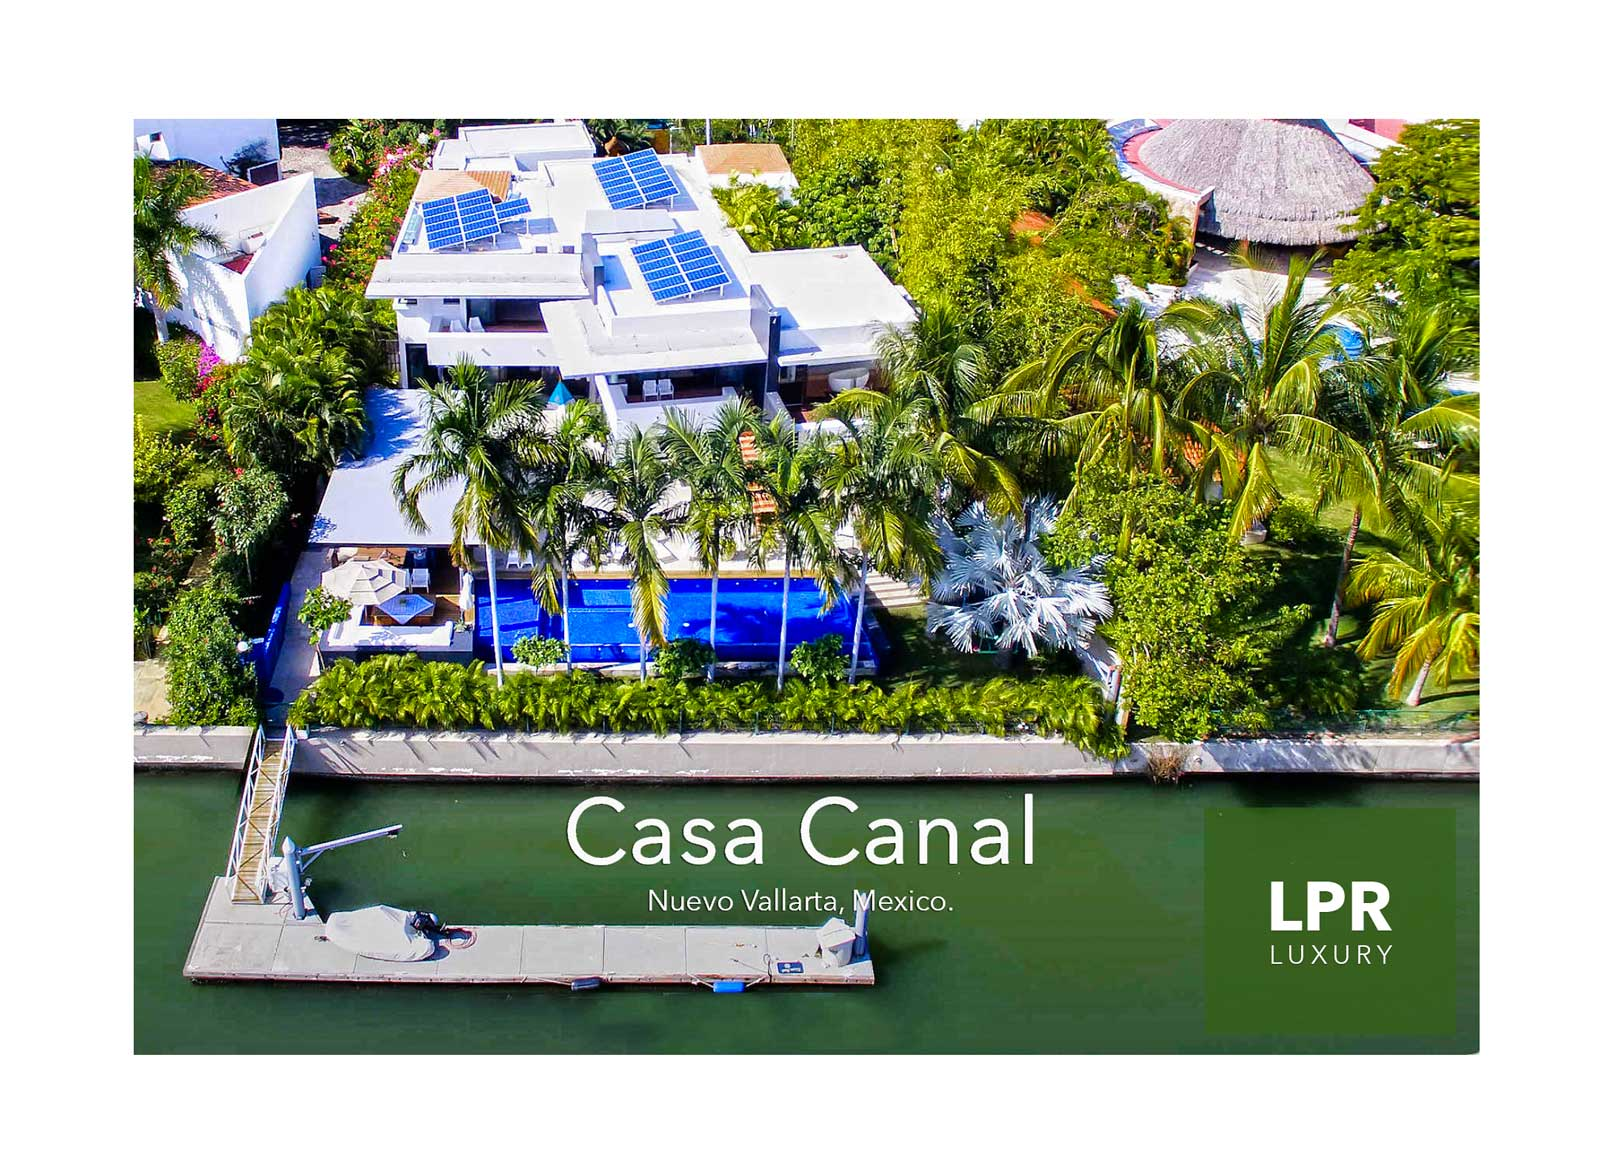 Casa Canal - Nuevo Vallarta - Riviera Nayarit, Mexico - Puerto Vallarta Luxury Real Estate